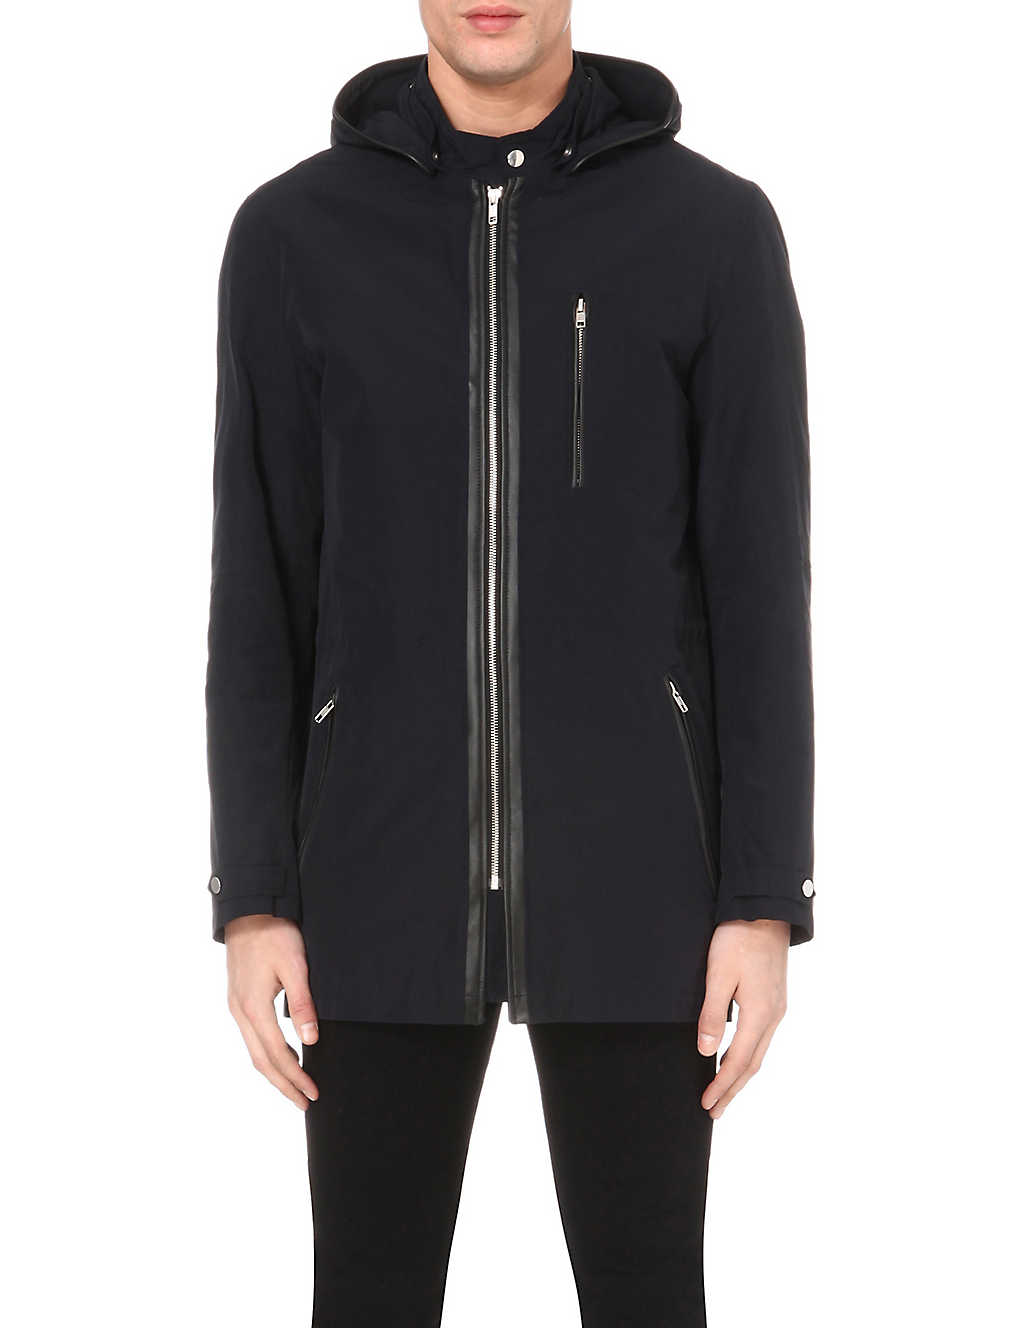 043262b5dc2 THE KOOPLES - Hooded cotton-blend jacket | Selfridges.com